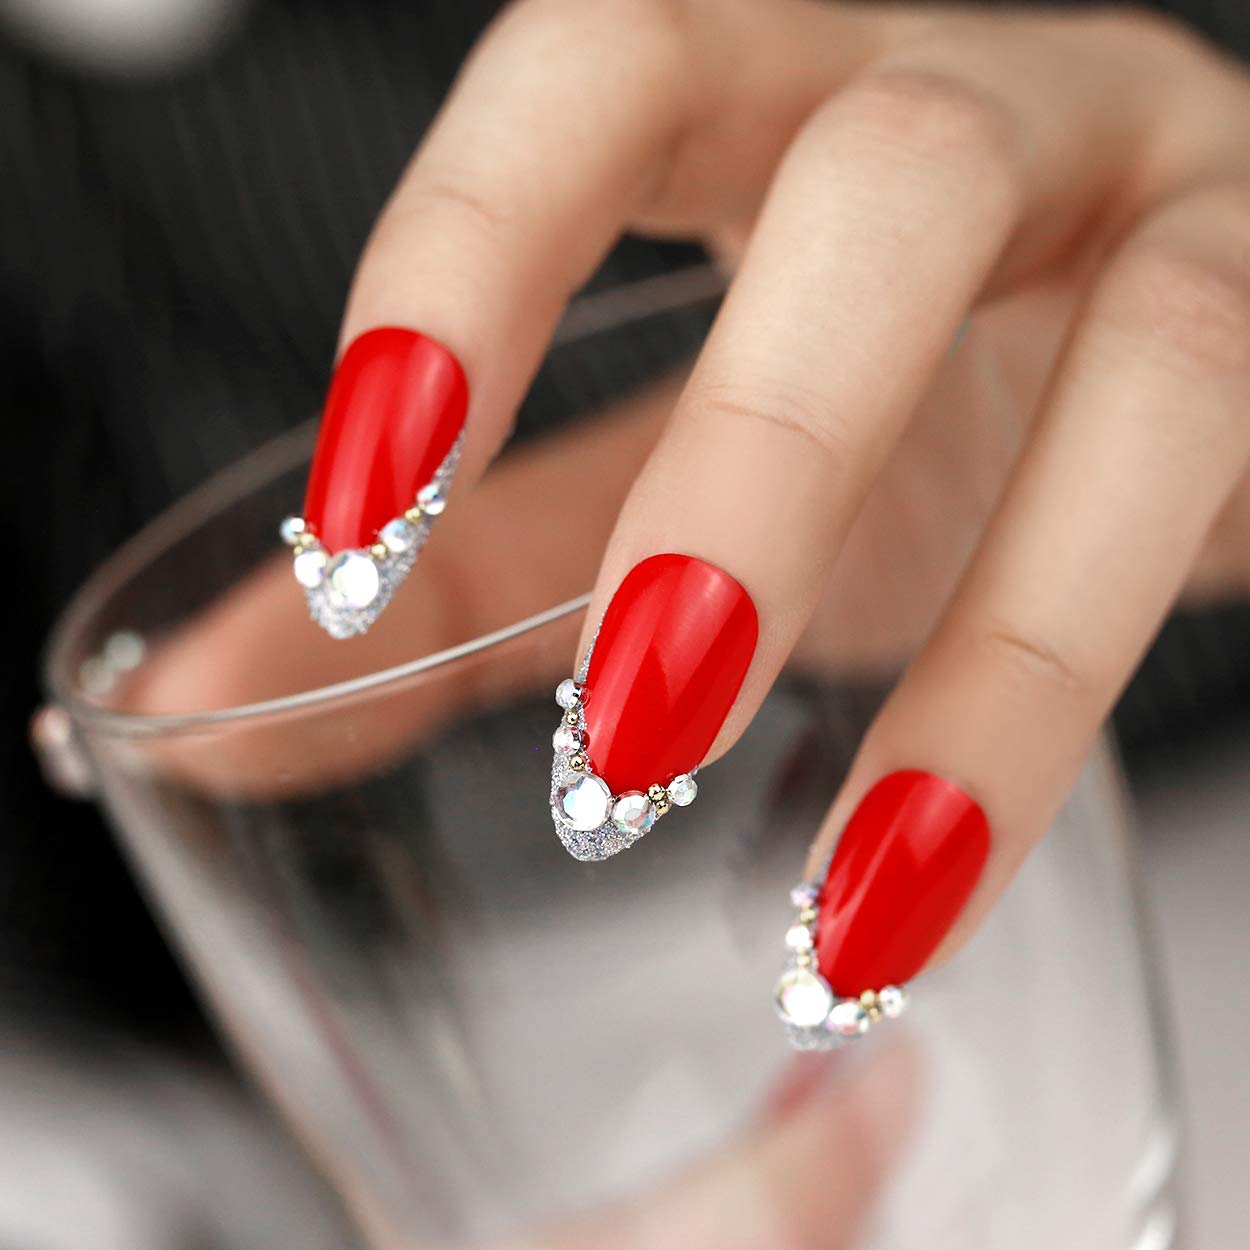 Amazon.com ArtPlus Fake Nails 24pcs Christmas Red Silver